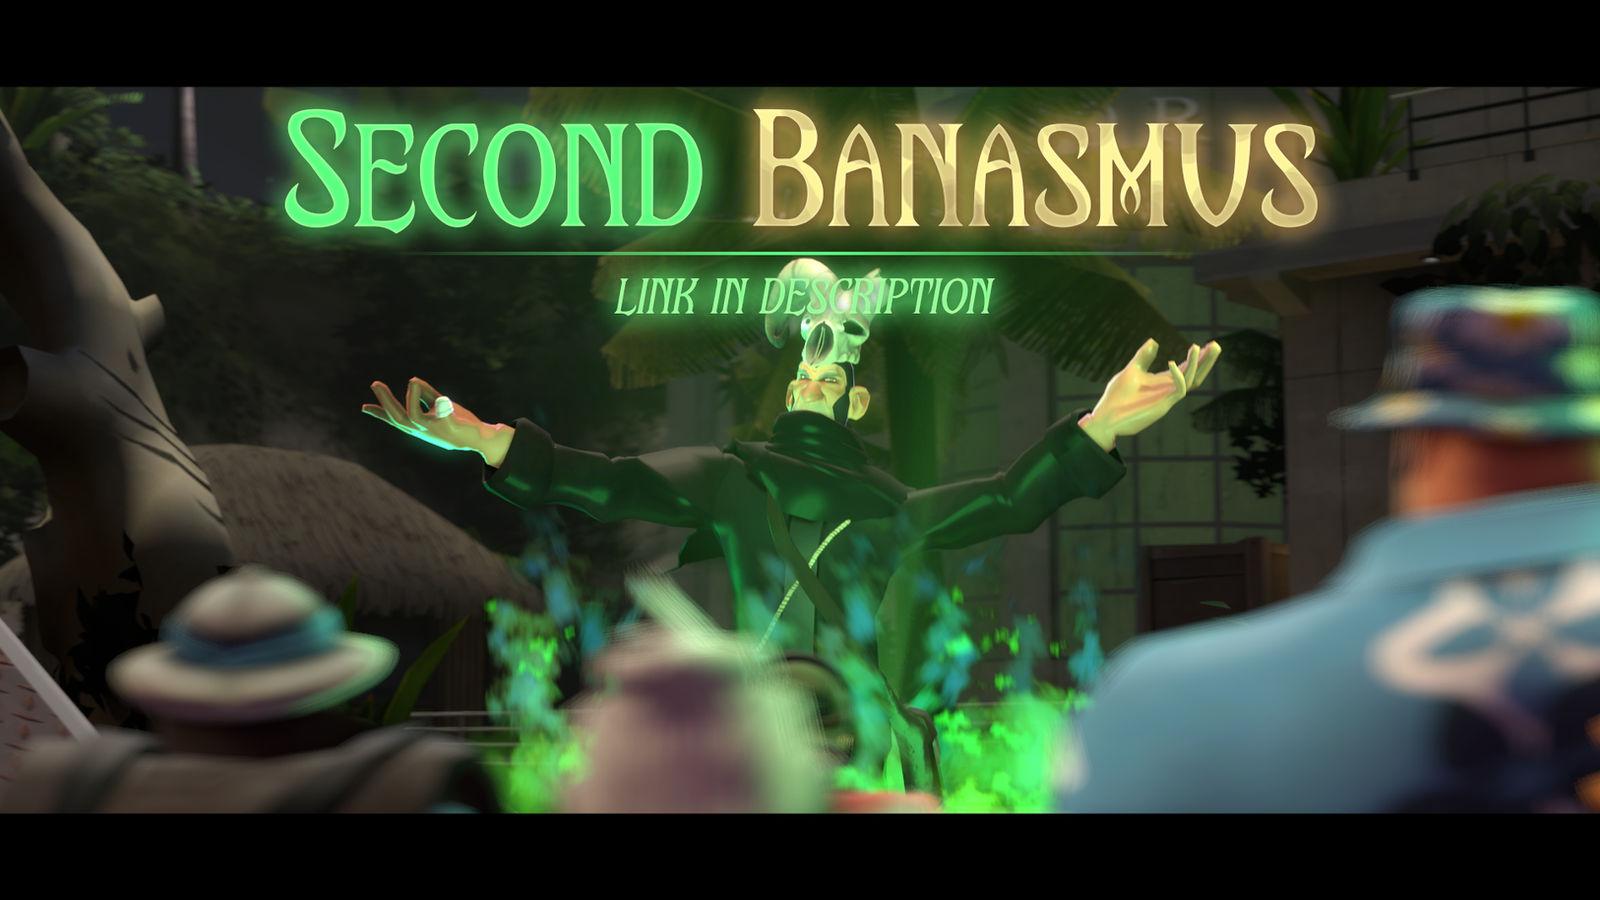 Second Banasmus by uberchain